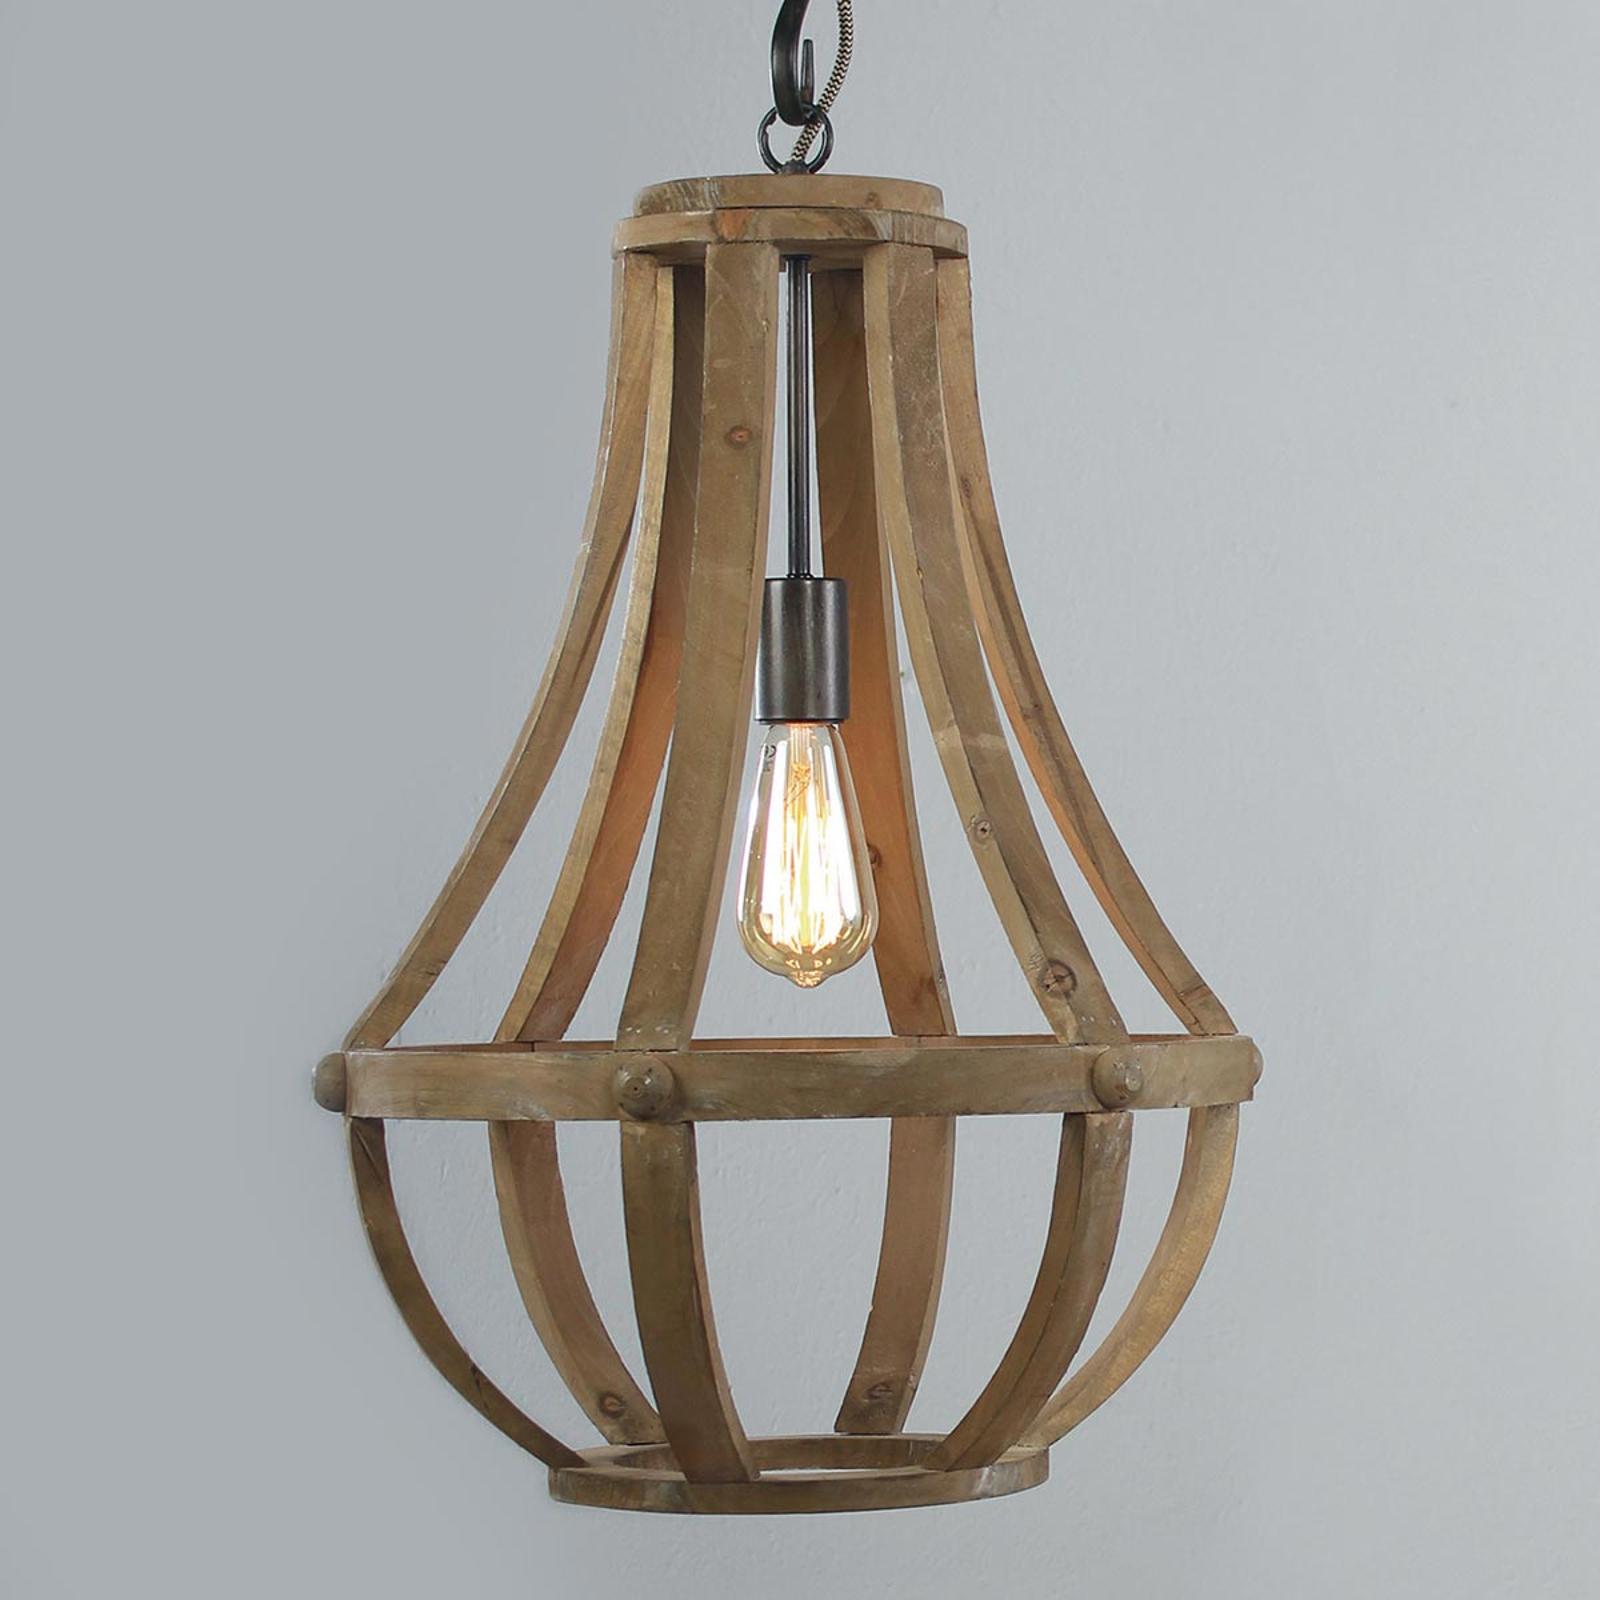 Suspension en bois Liberty Bell